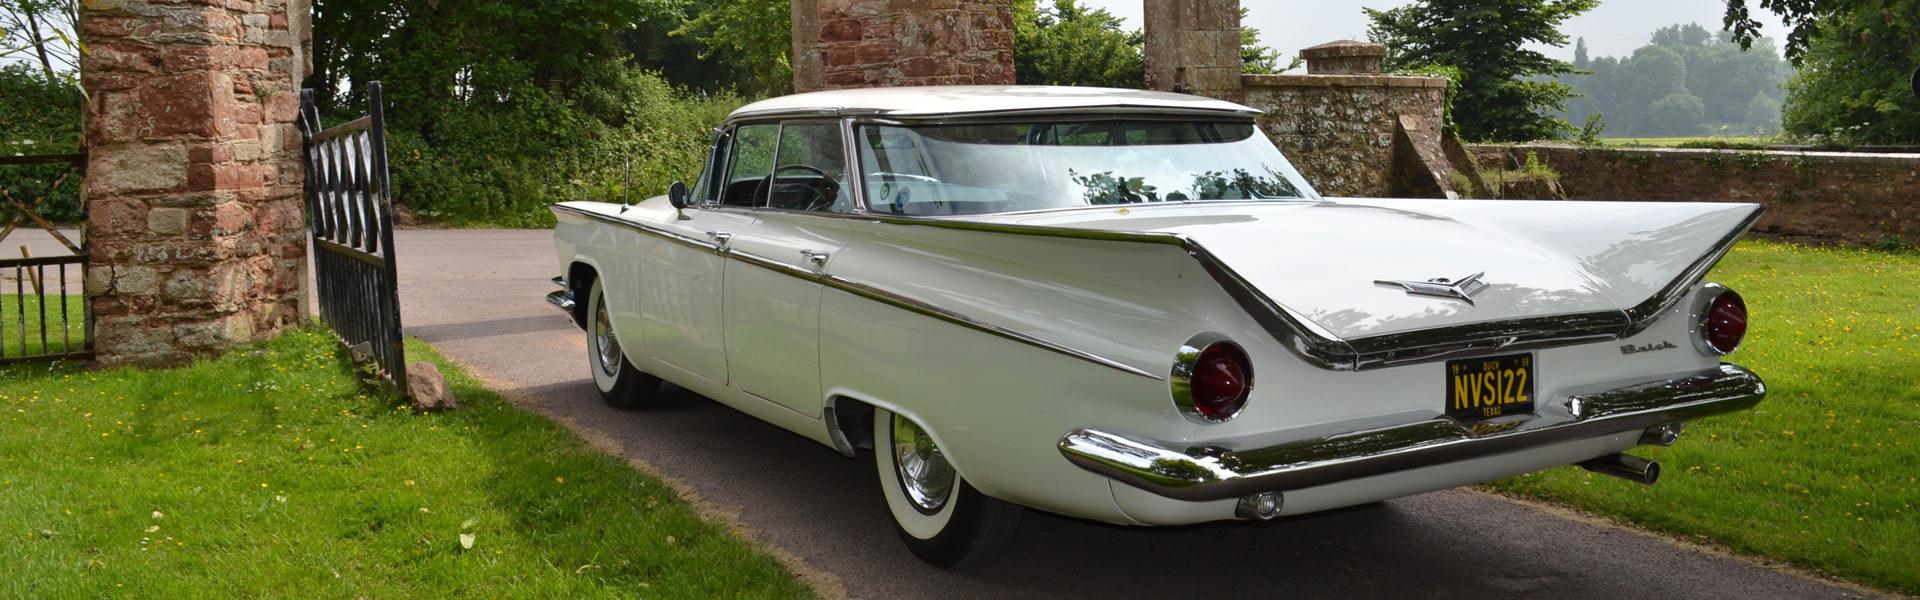 Wedding Cars Somerset, Wedding Cars Devon, American Wedding Cars